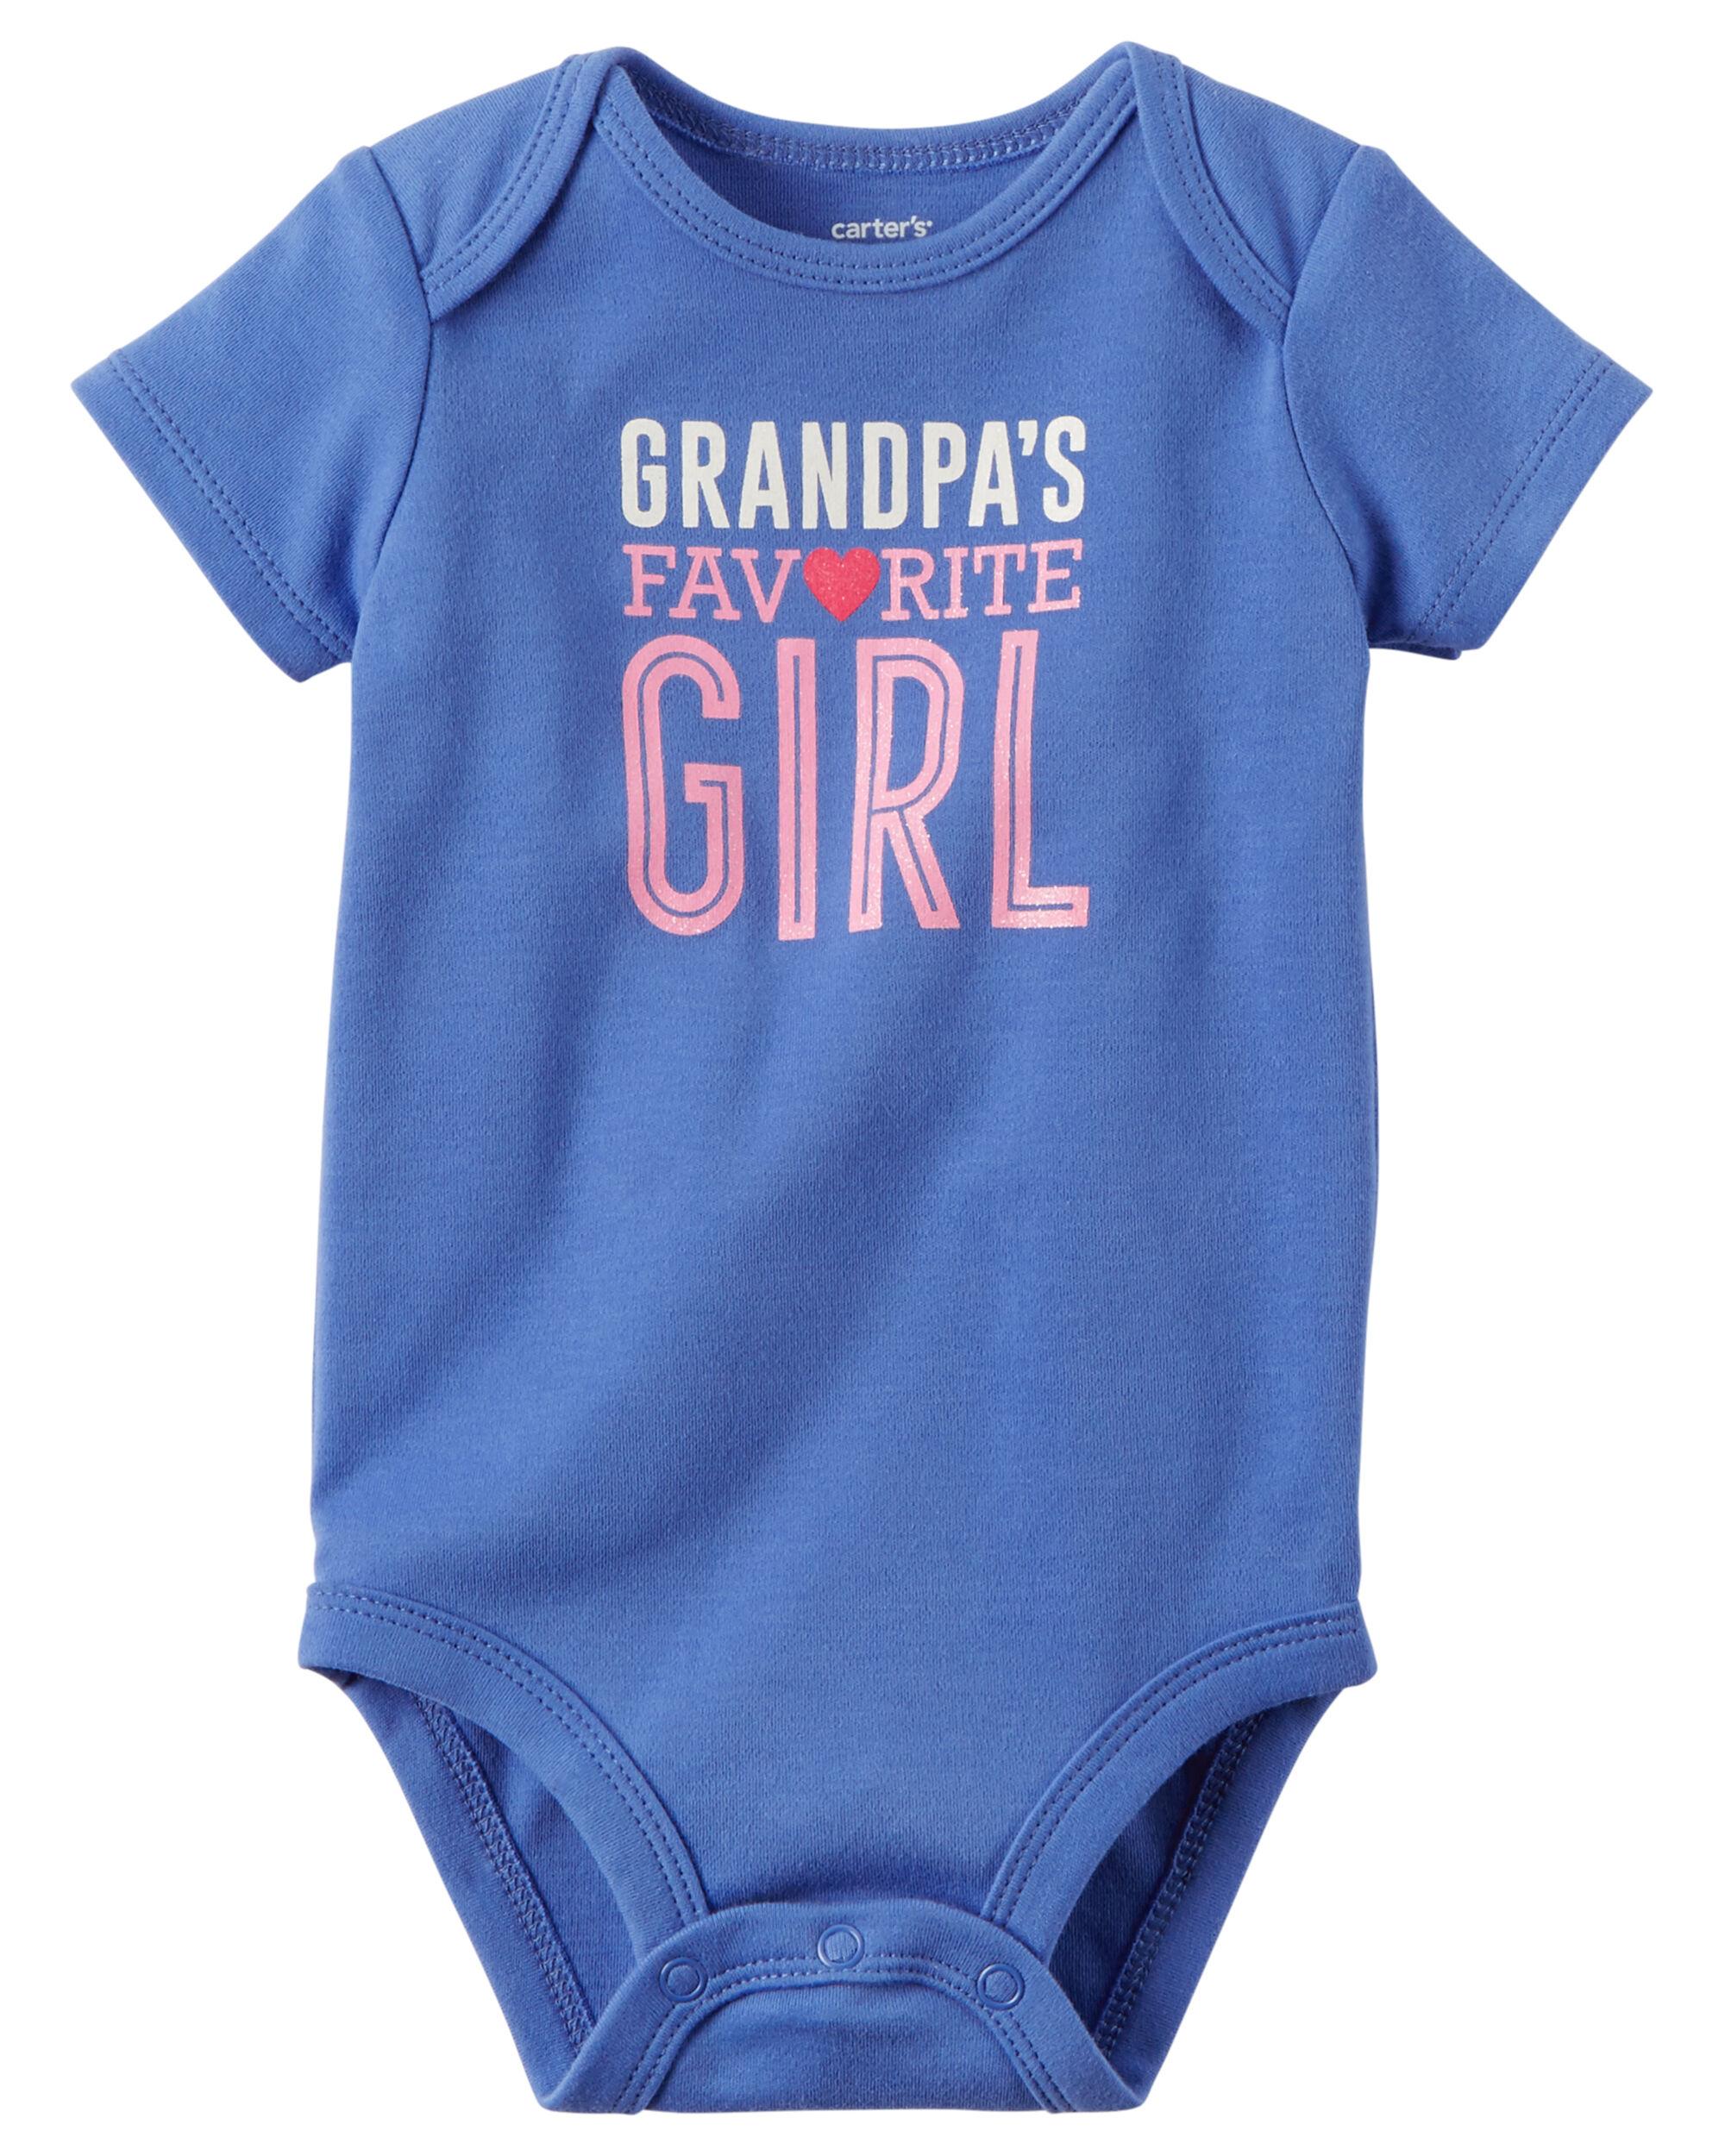 Grandpa s Favorite Girl Collectible Bodysuit